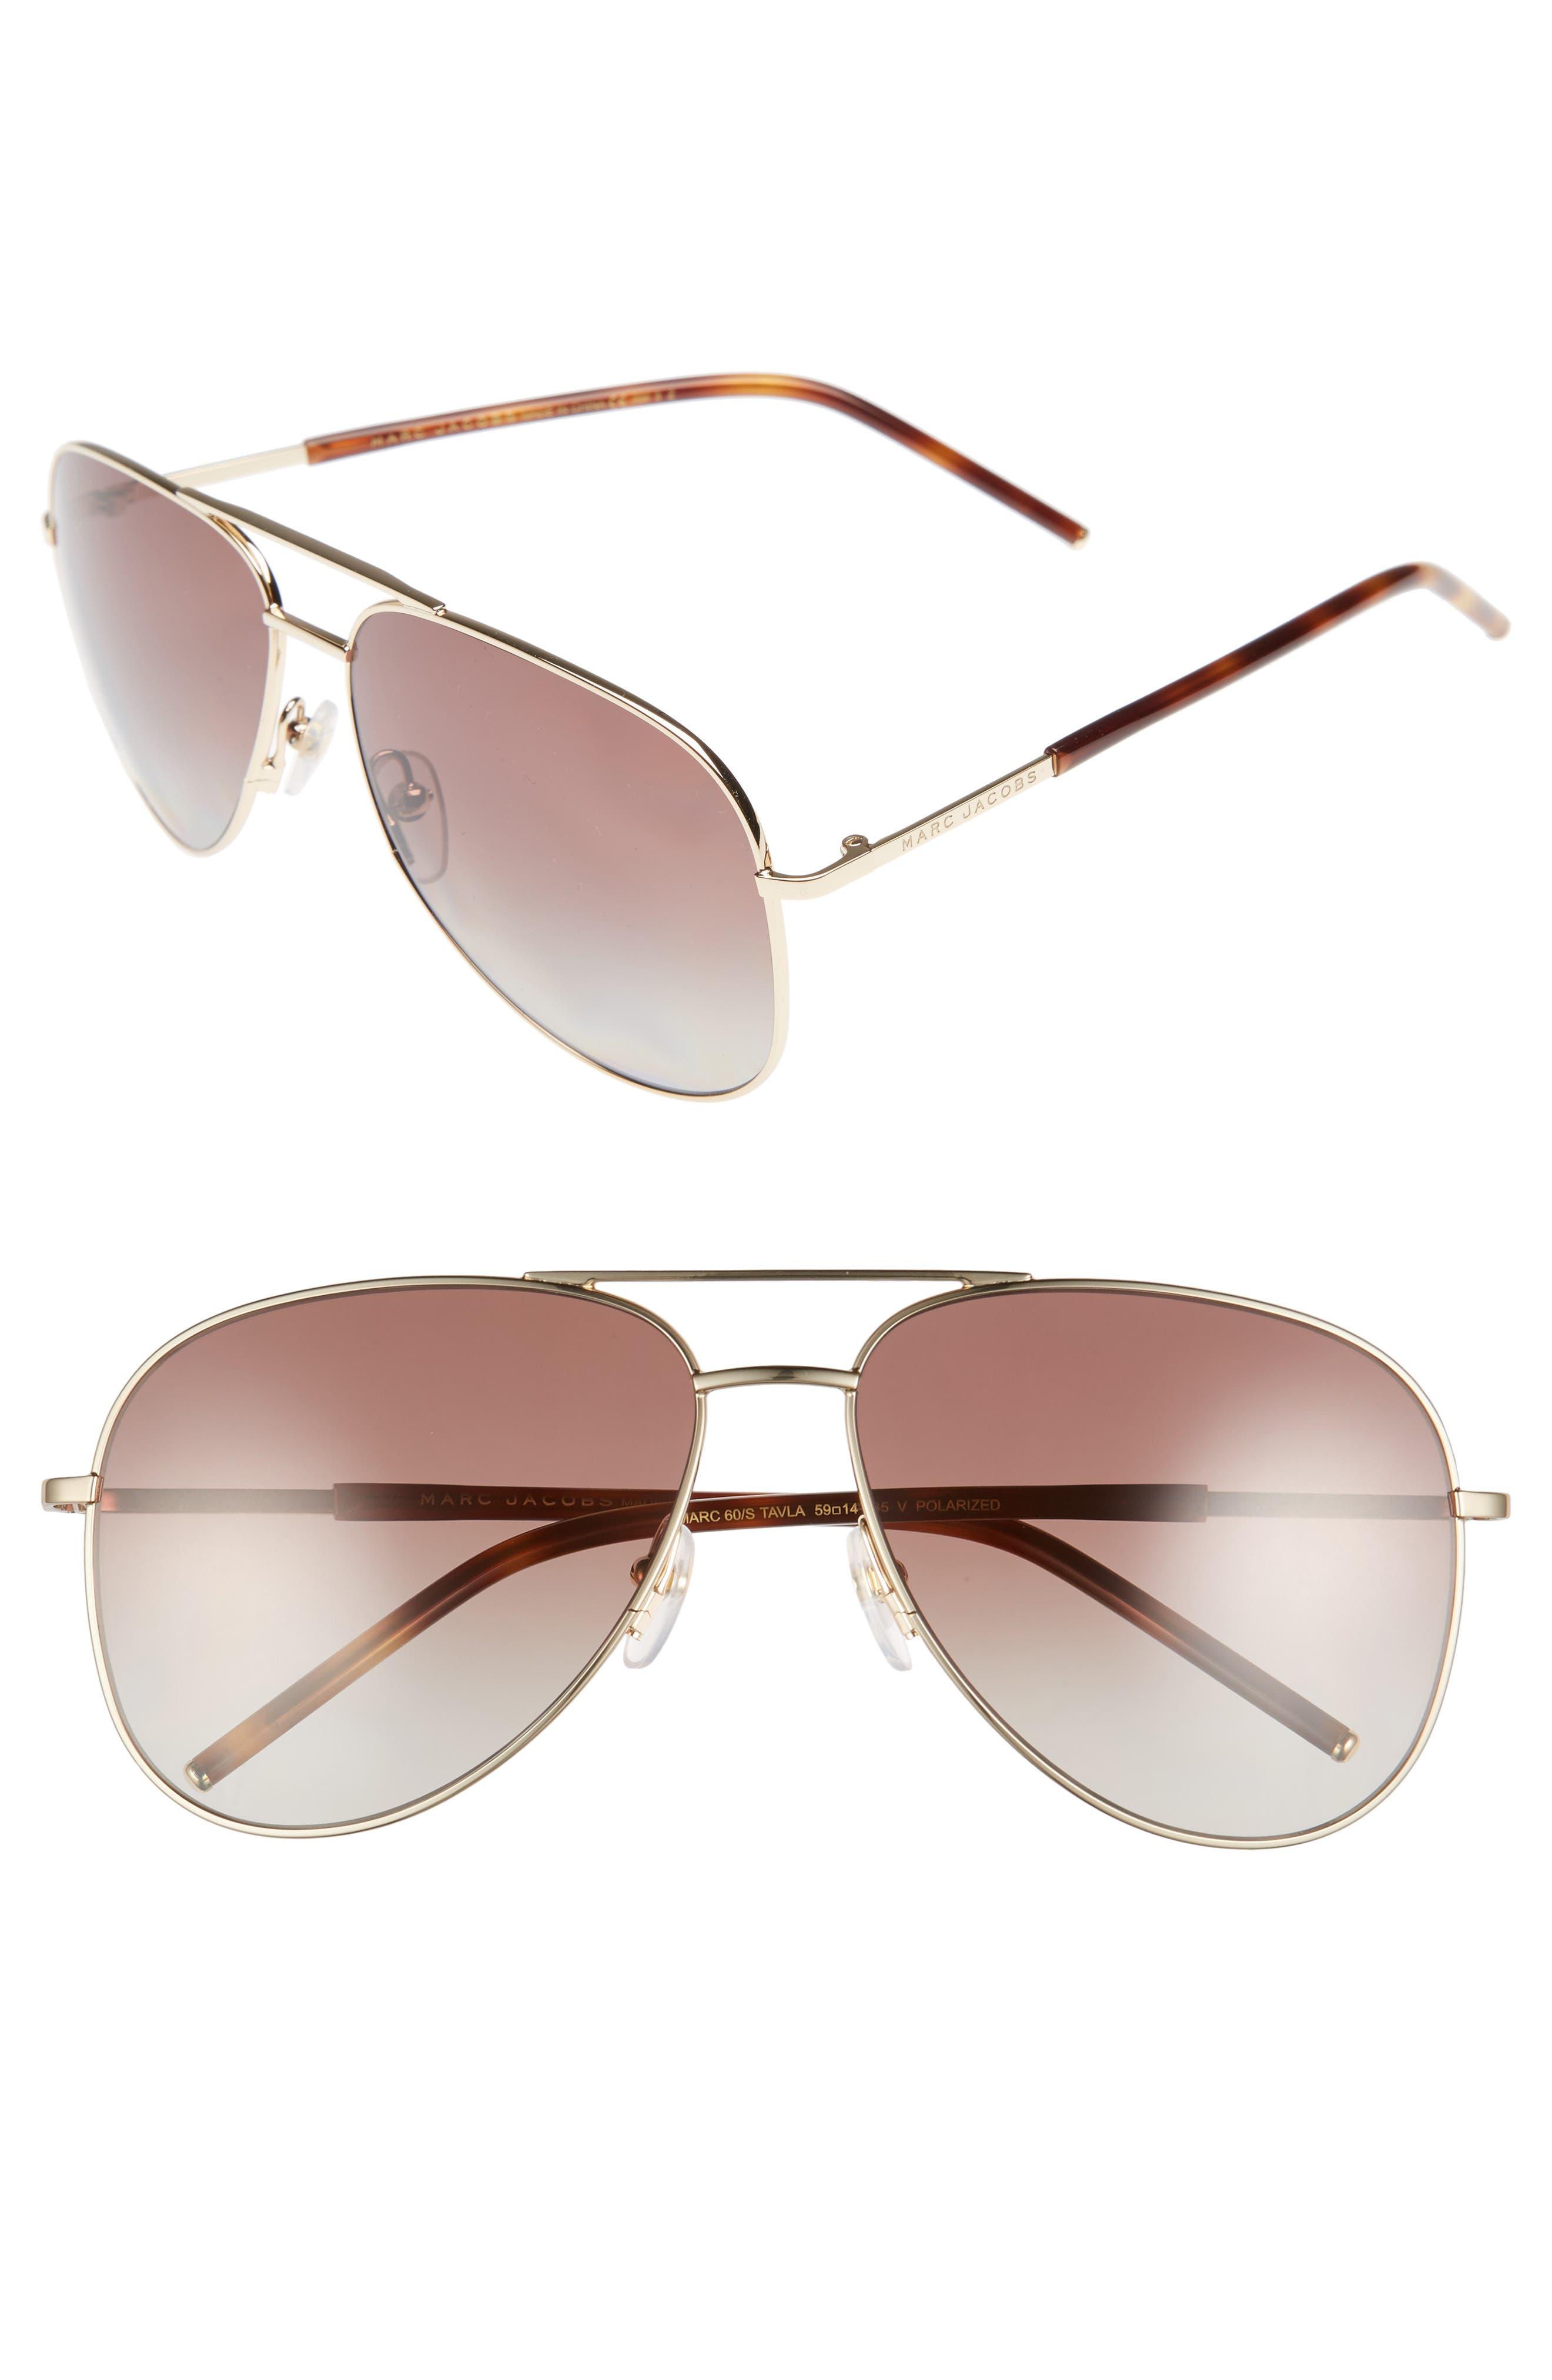 MARC JACOBS 59mm Gradient Polarized Aviator Sunglasses